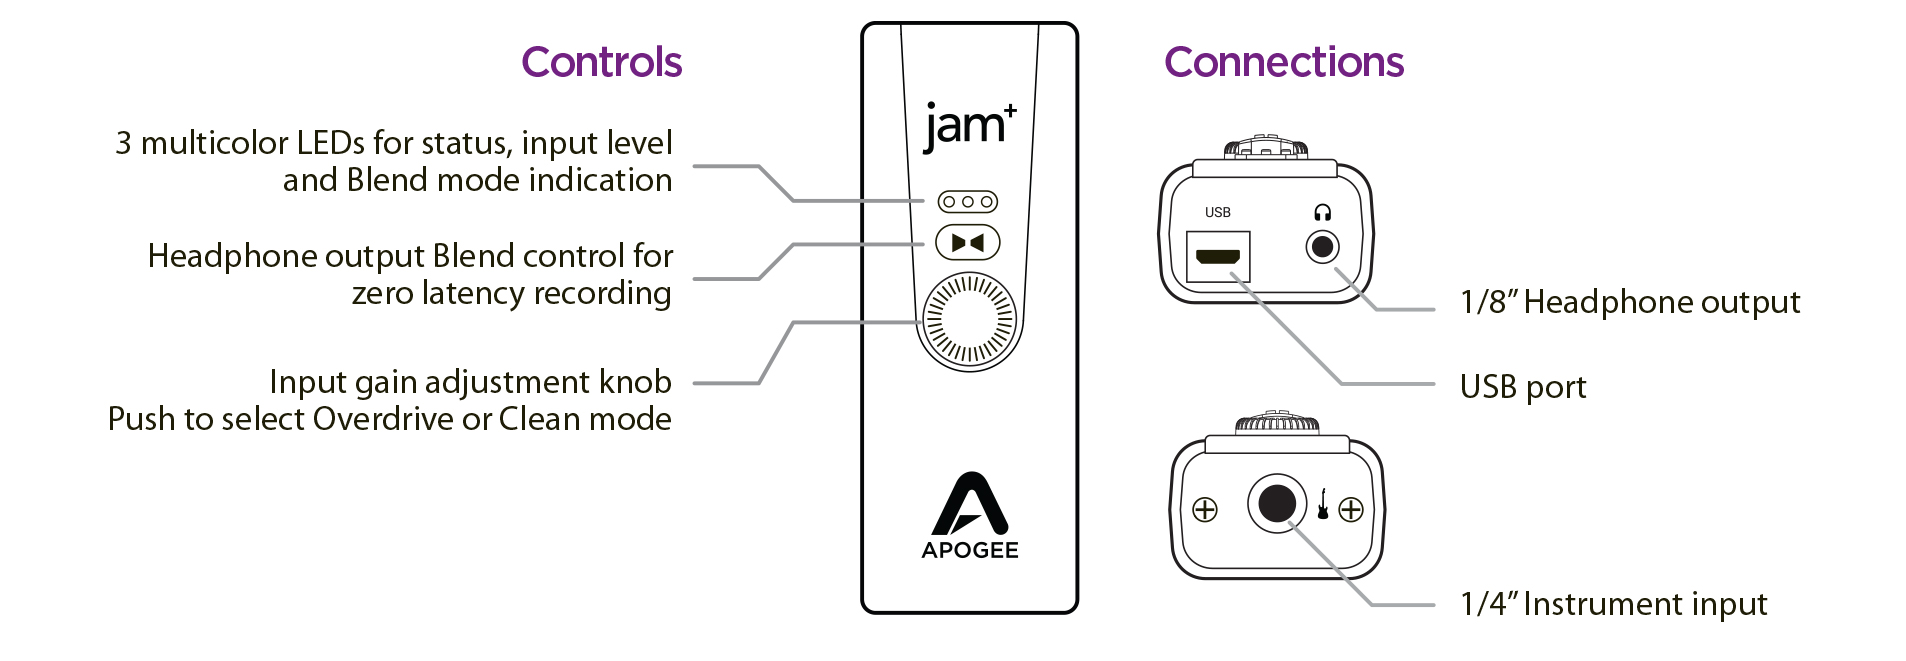 Apogee Jam Plus Product Tour